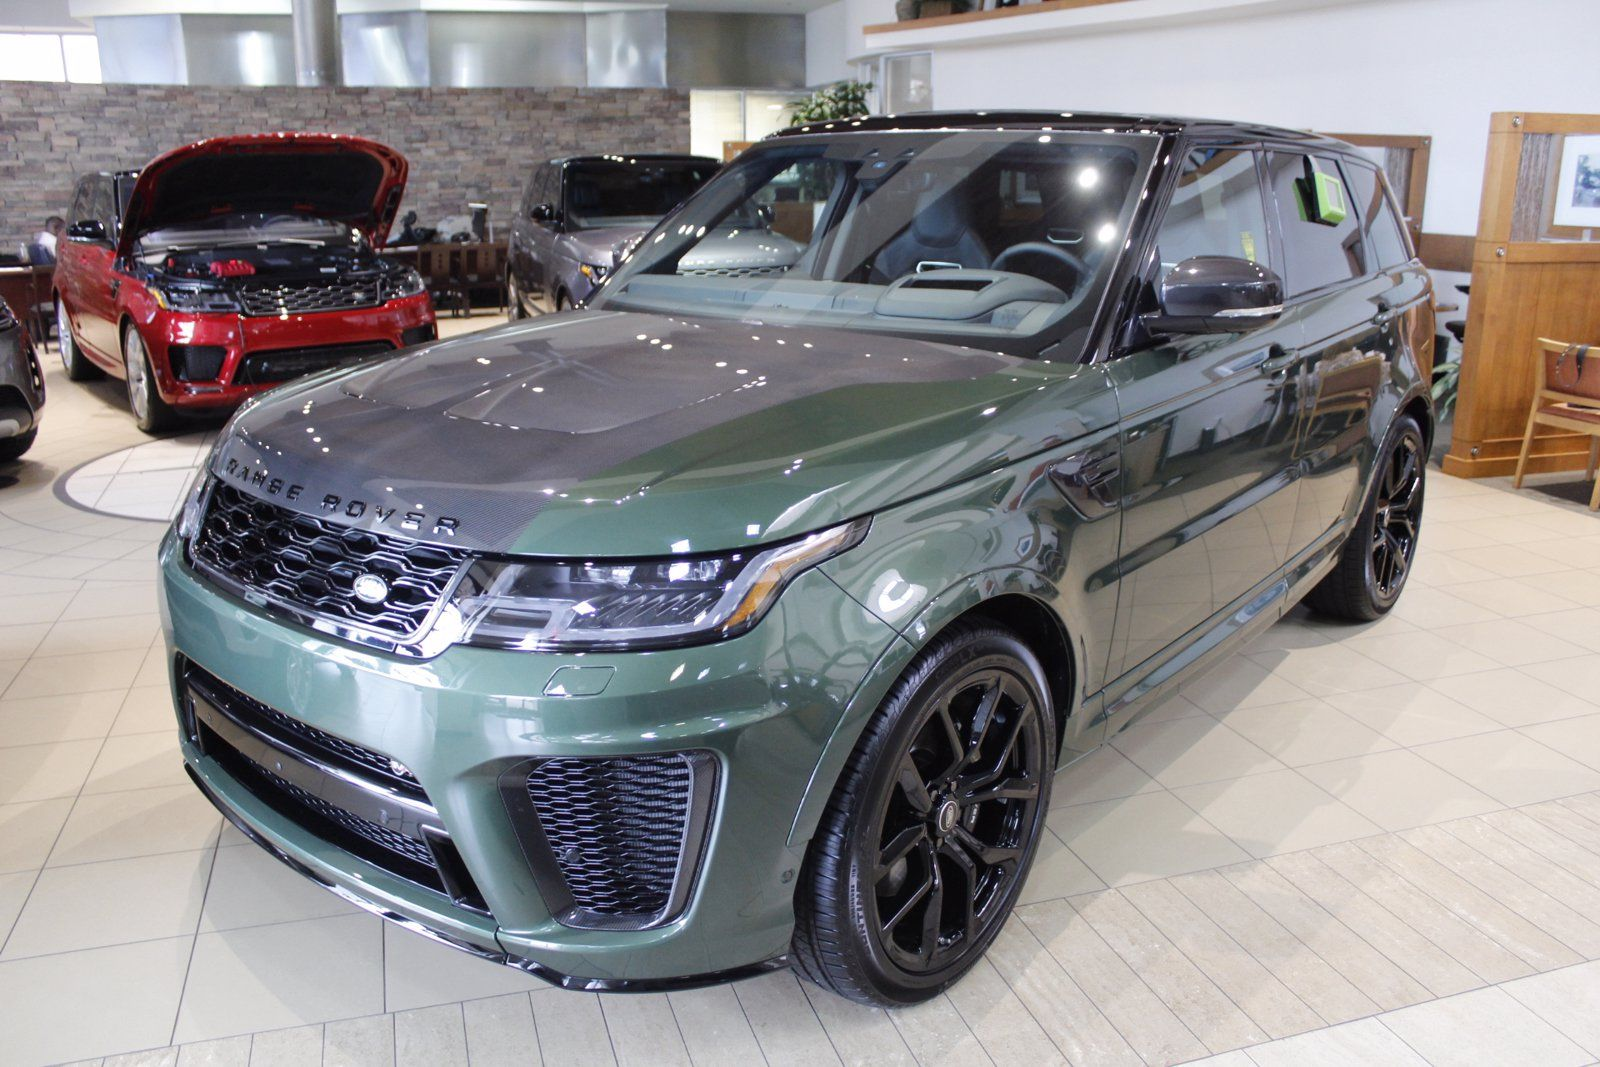 Explore The 2020 Land Rover Range Rover Sport Svr At Land Rover Southwest Houston In Houston Tx Vin Salwz2re2la7428 Range Rover Sport Land Rover Range Rover